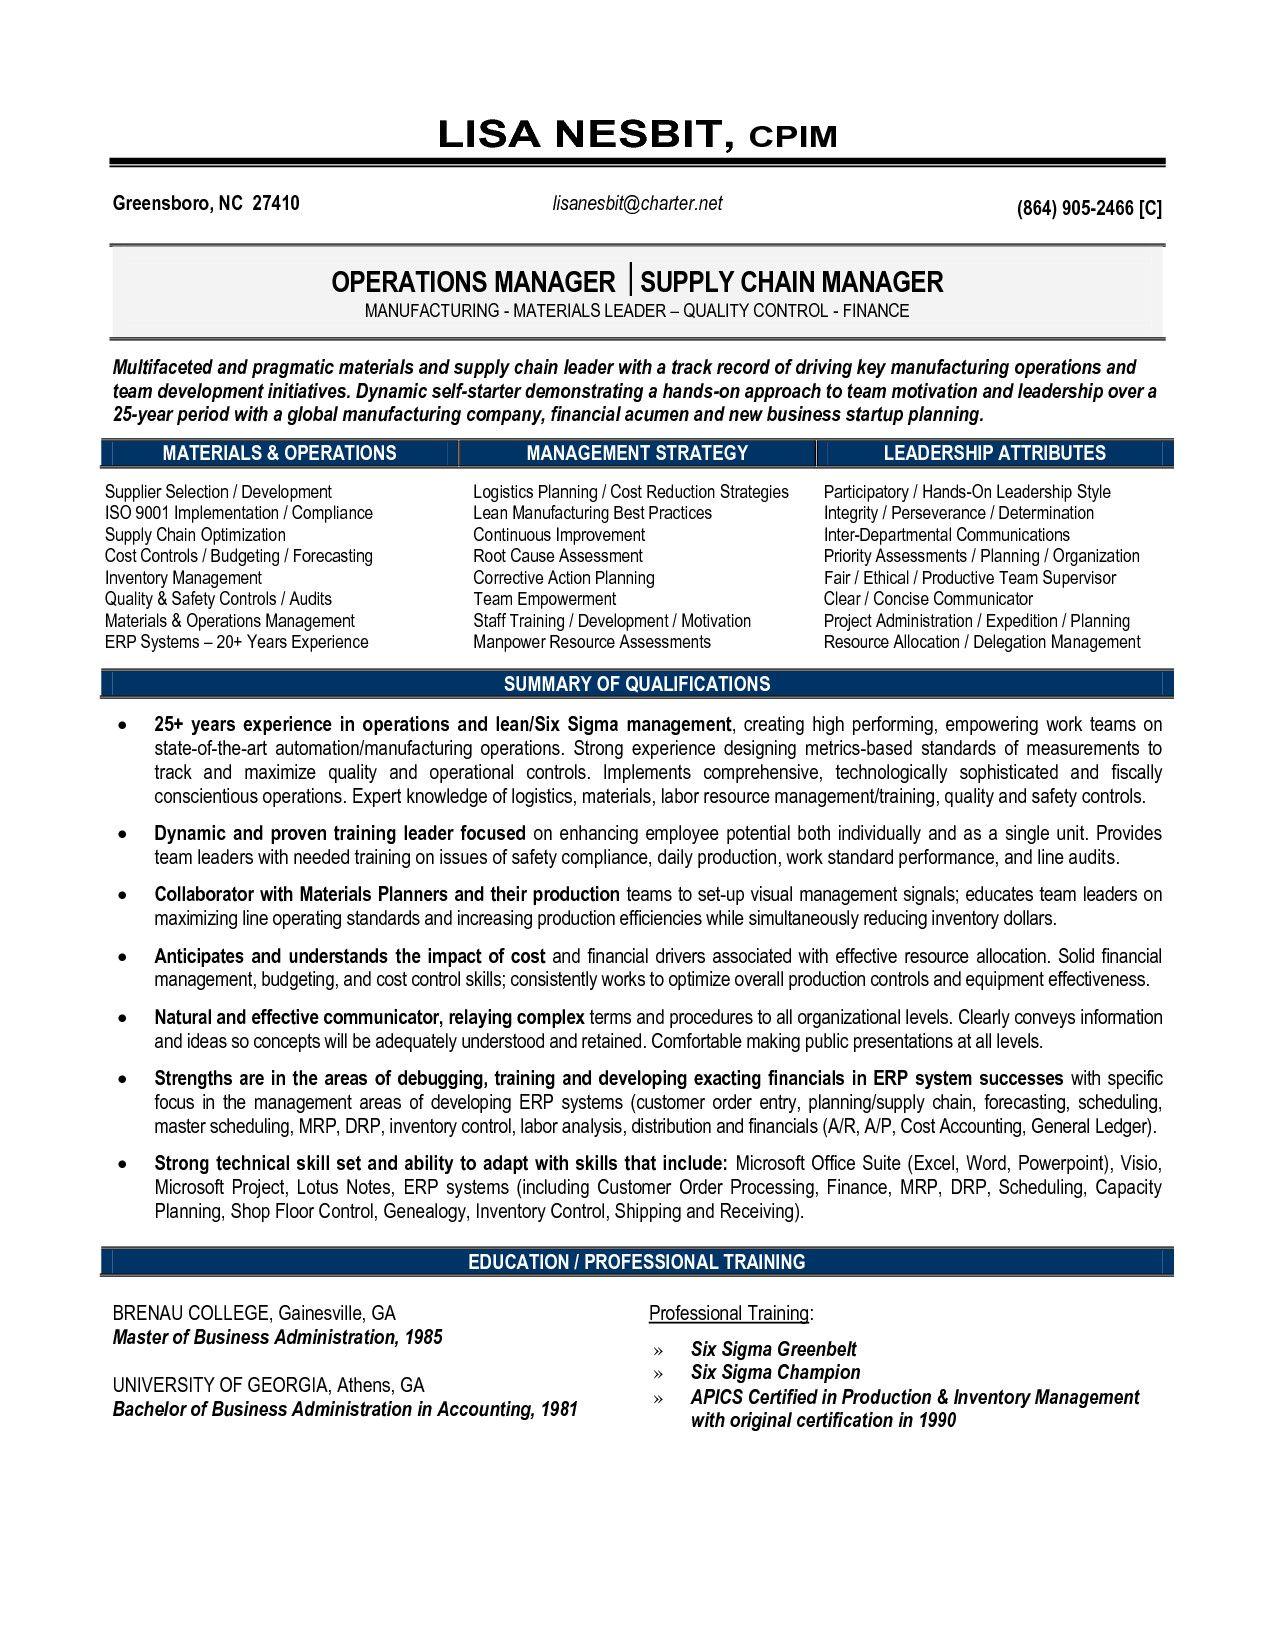 Supply Chain Manager Resume Resume Senior Operations Manager Senior Manager Operations Operations Management Logistics Management Resume Examples